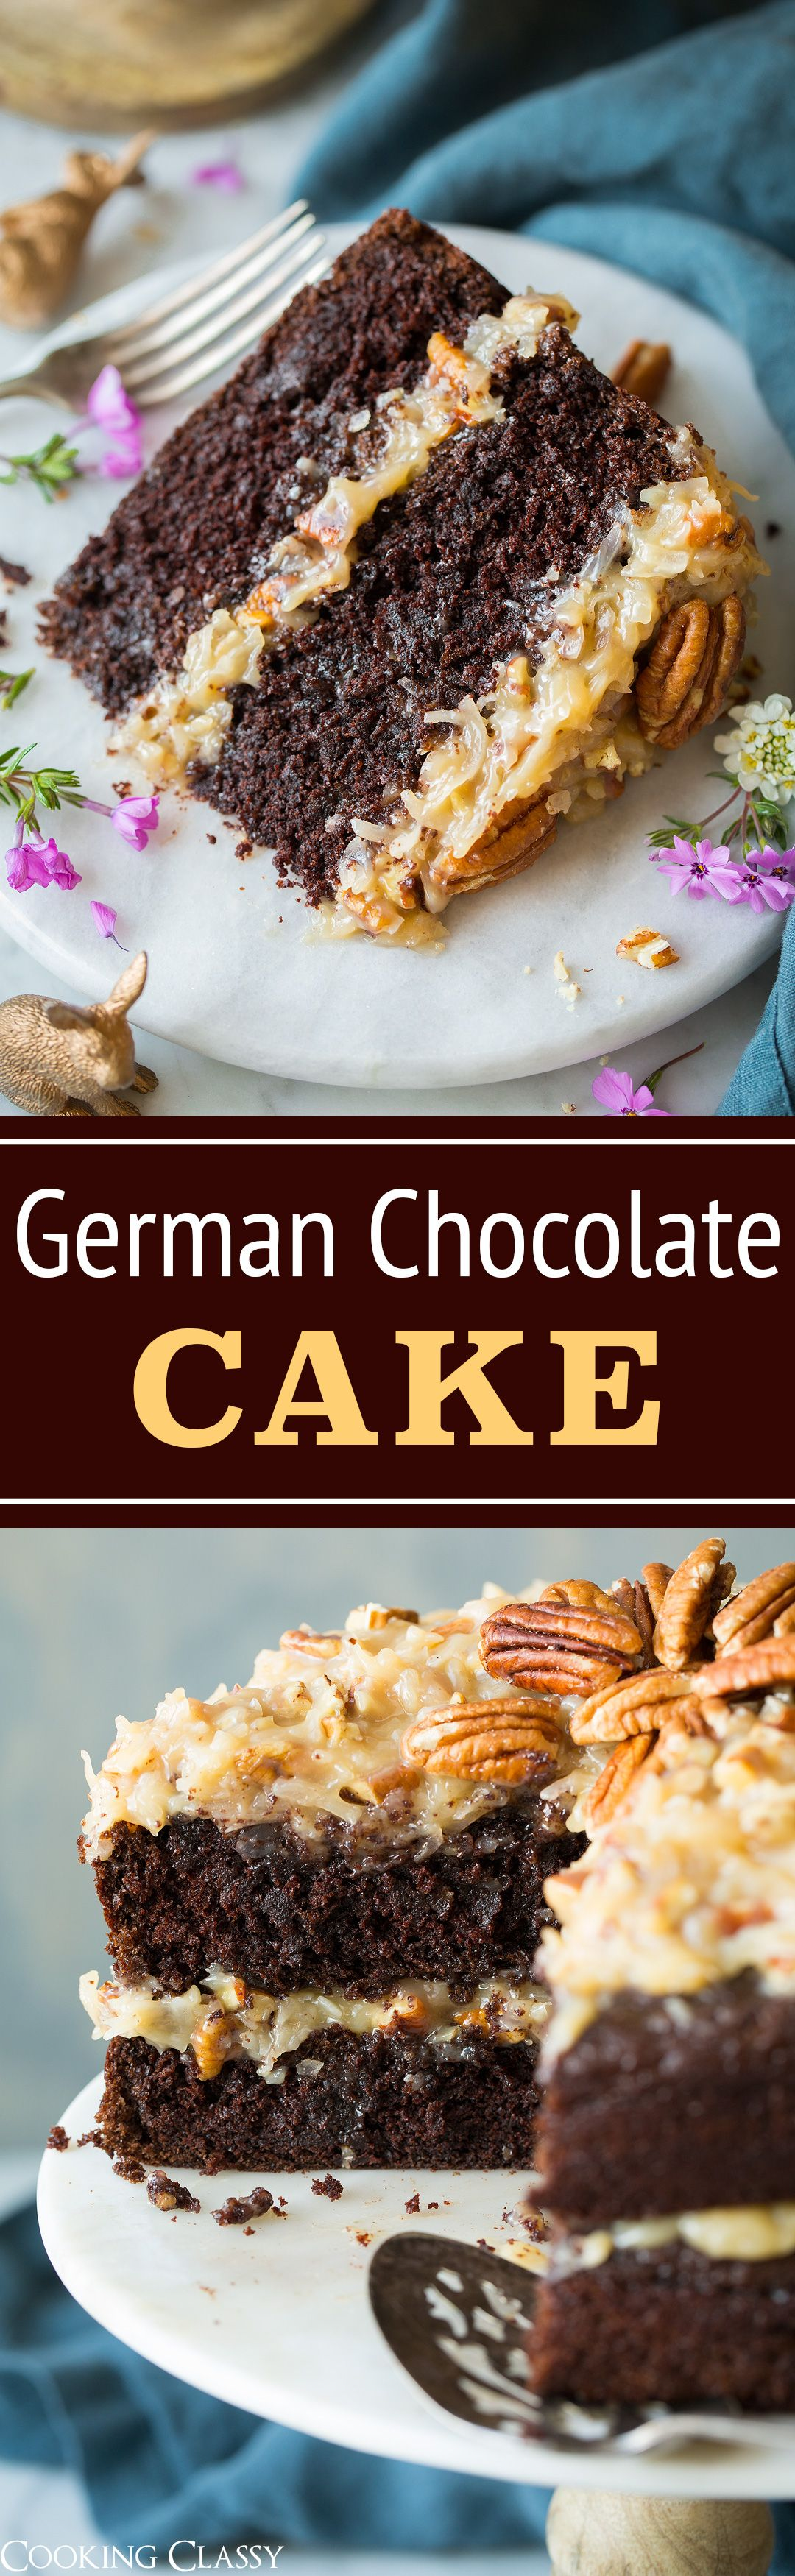 German glace recipe